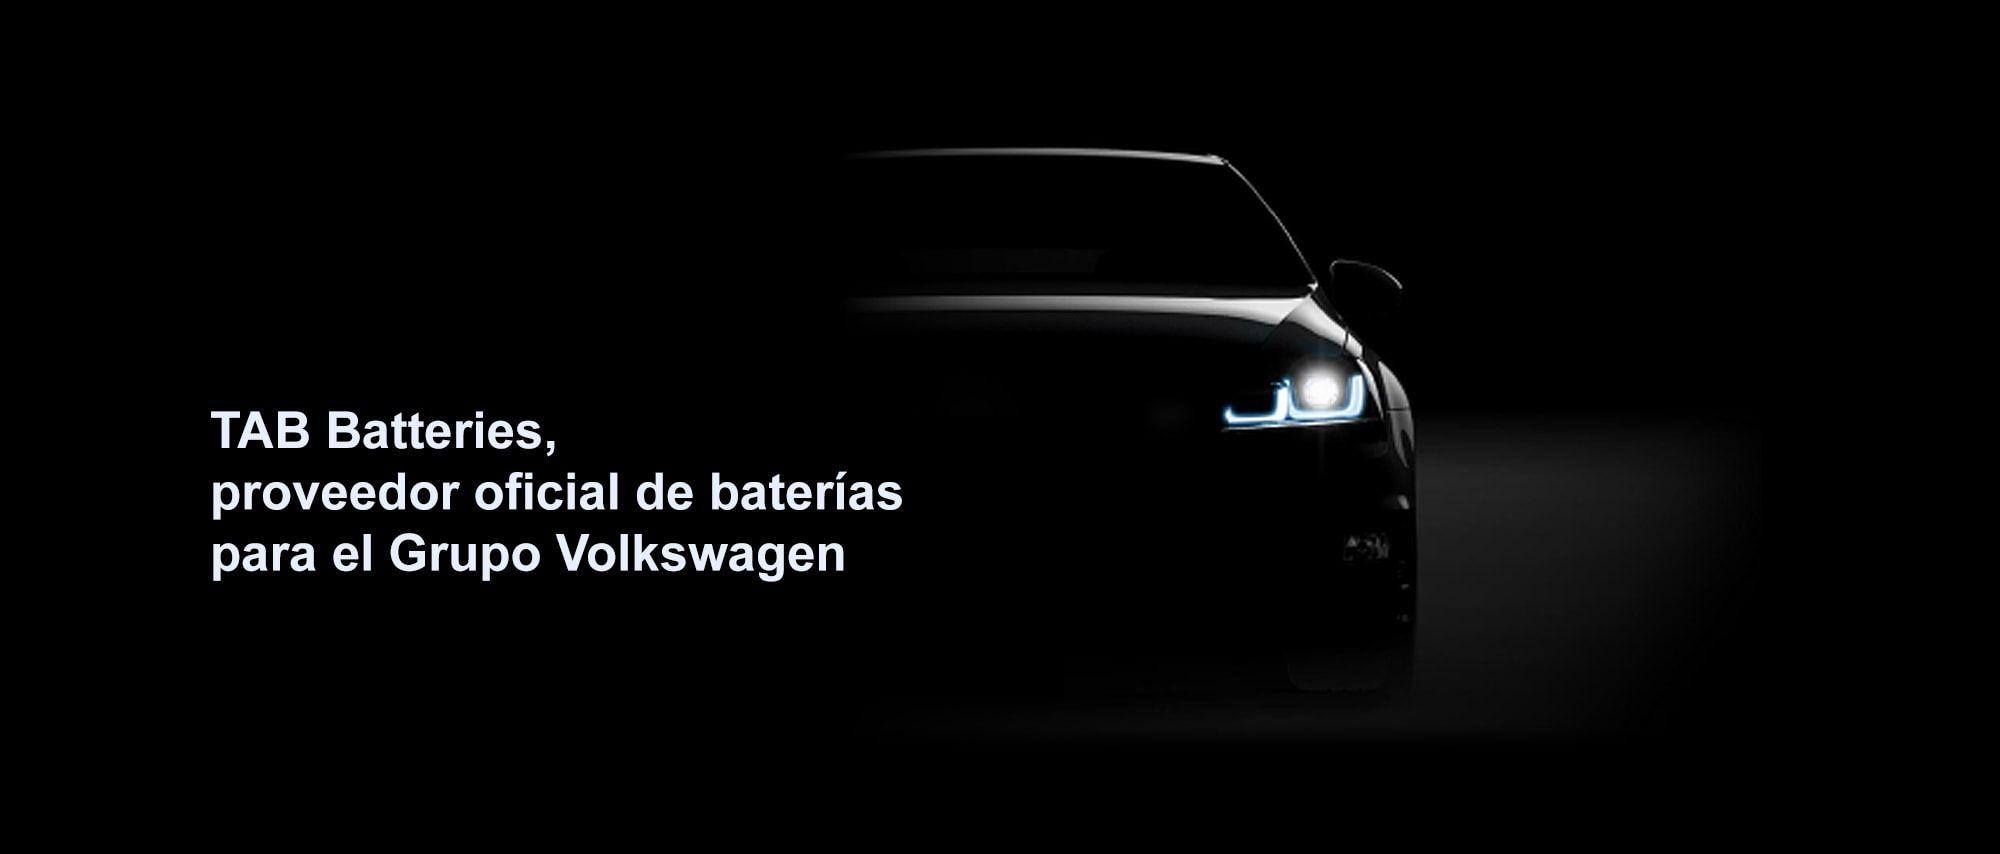 Acuerdo con VW